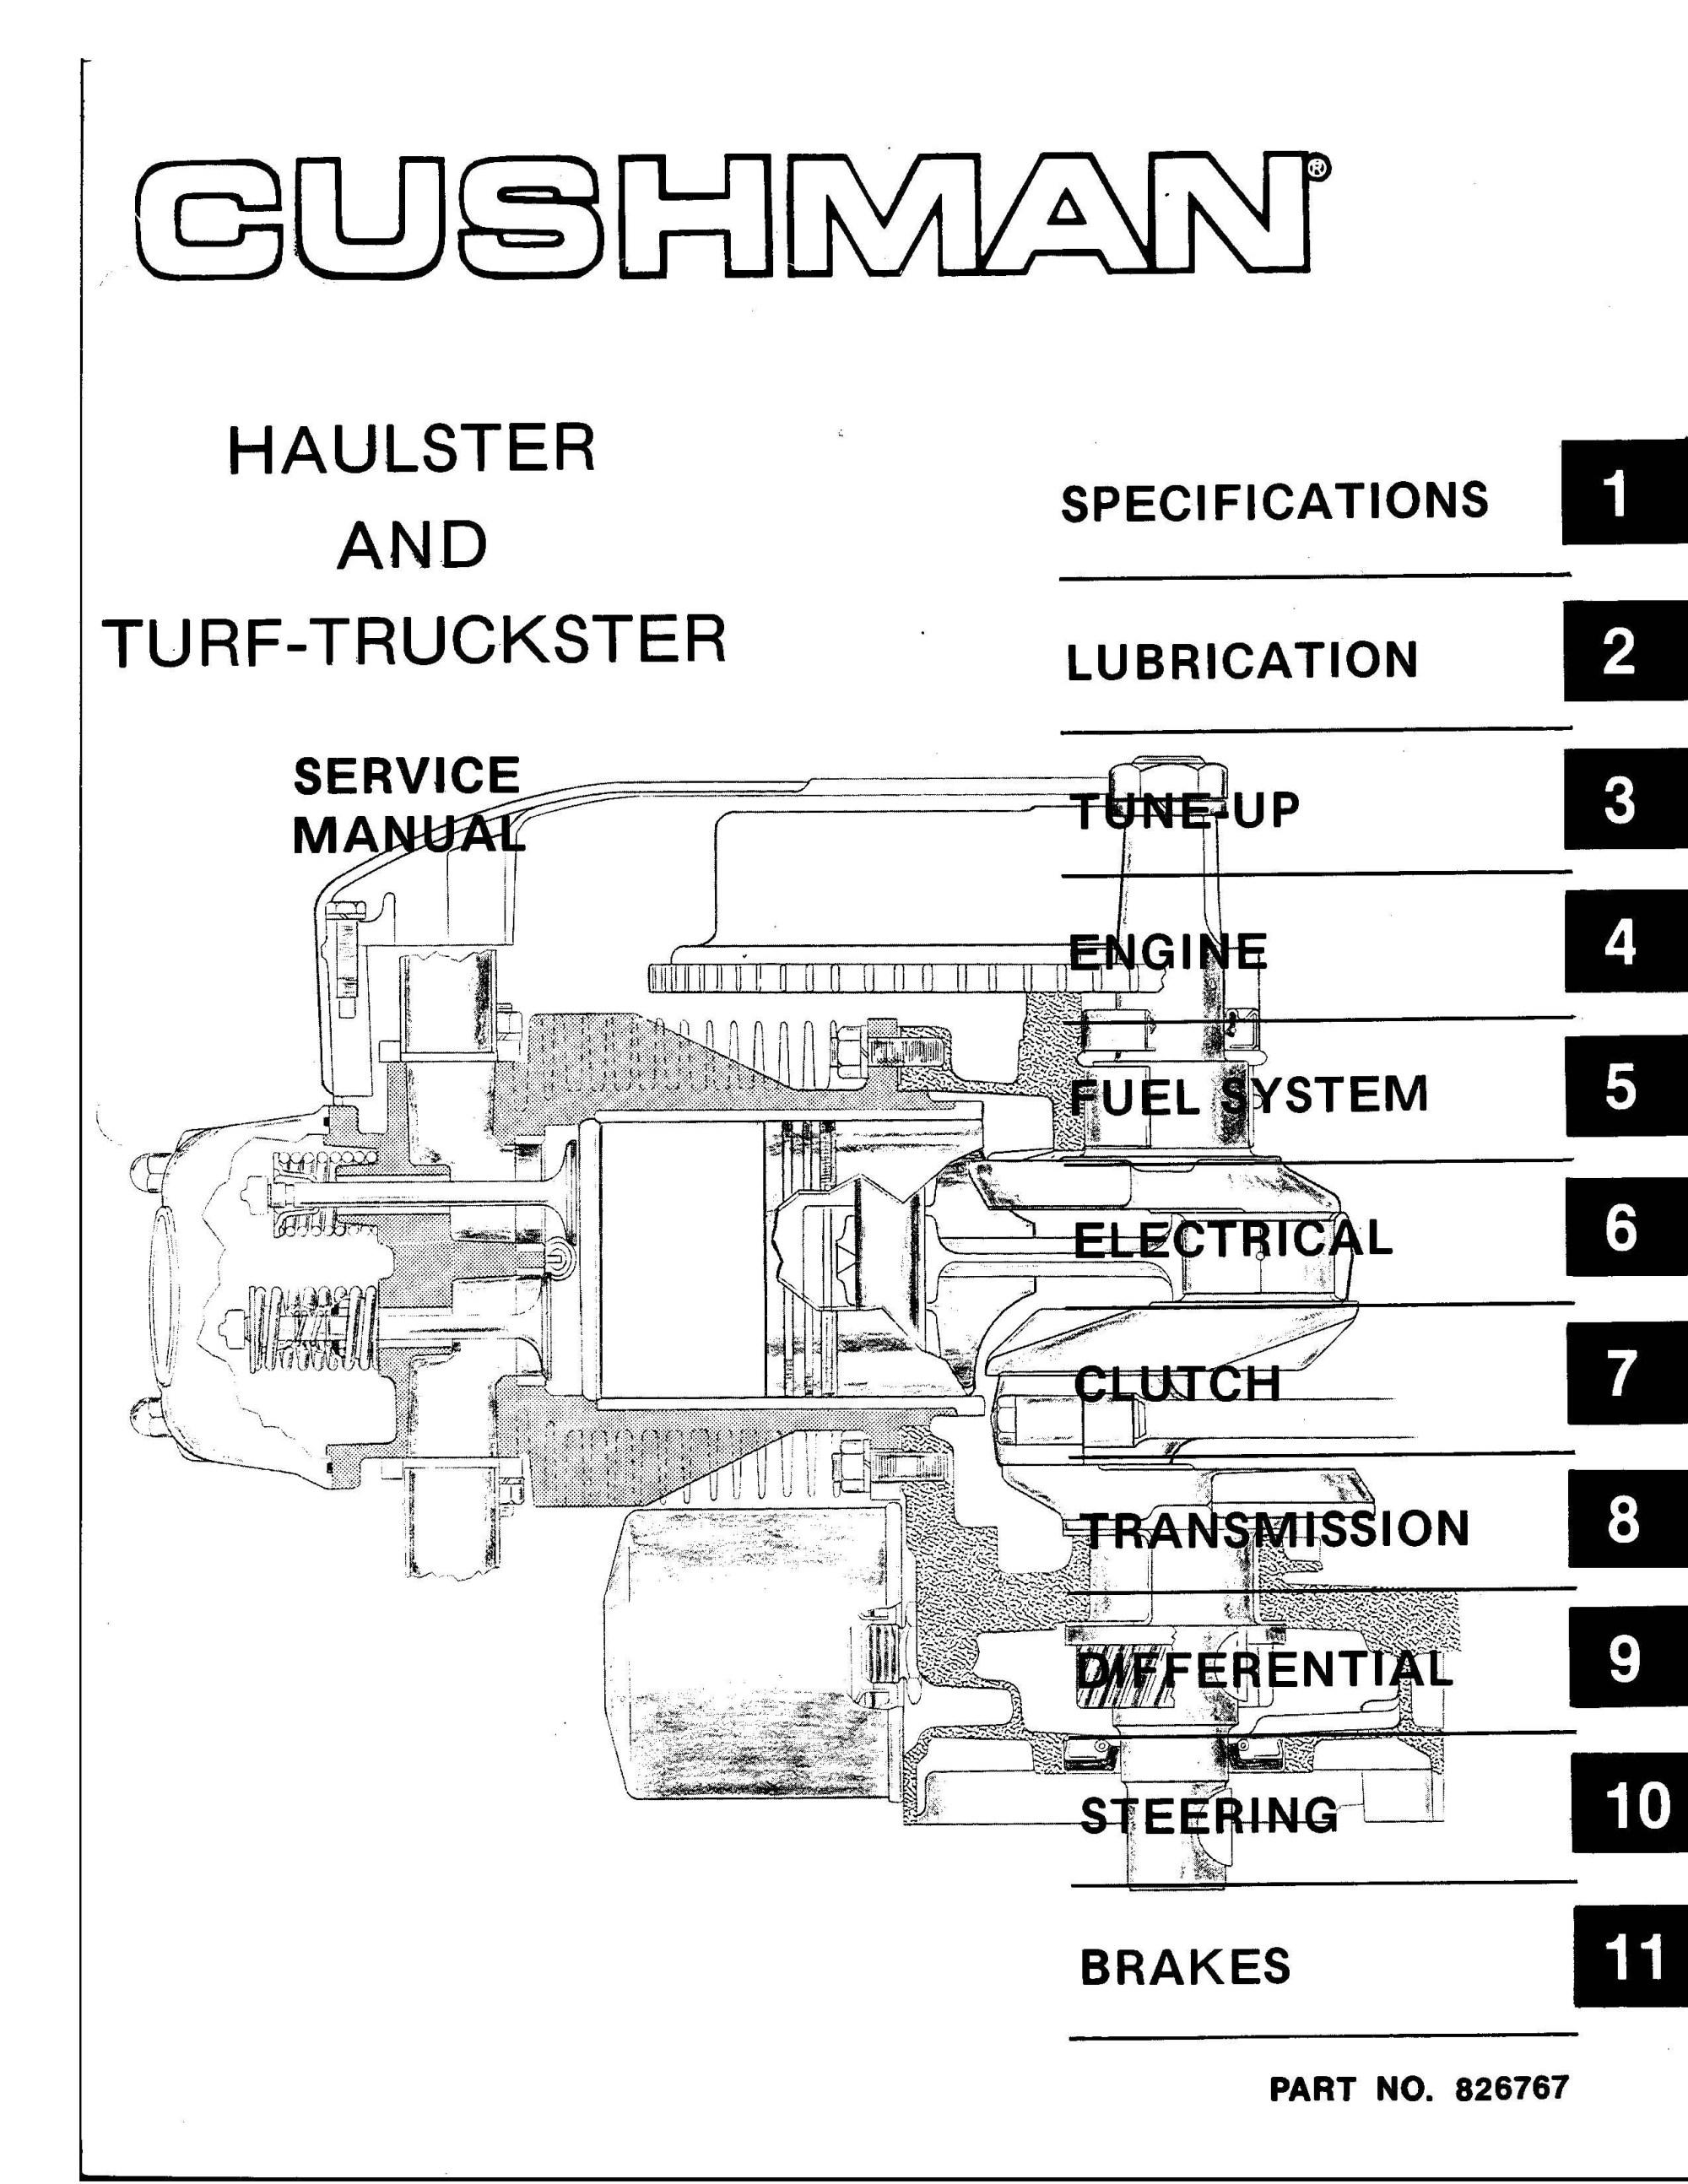 hight resolution of club car parts diagram september 2017 archives 23 club car carburetor diagram of club car parts